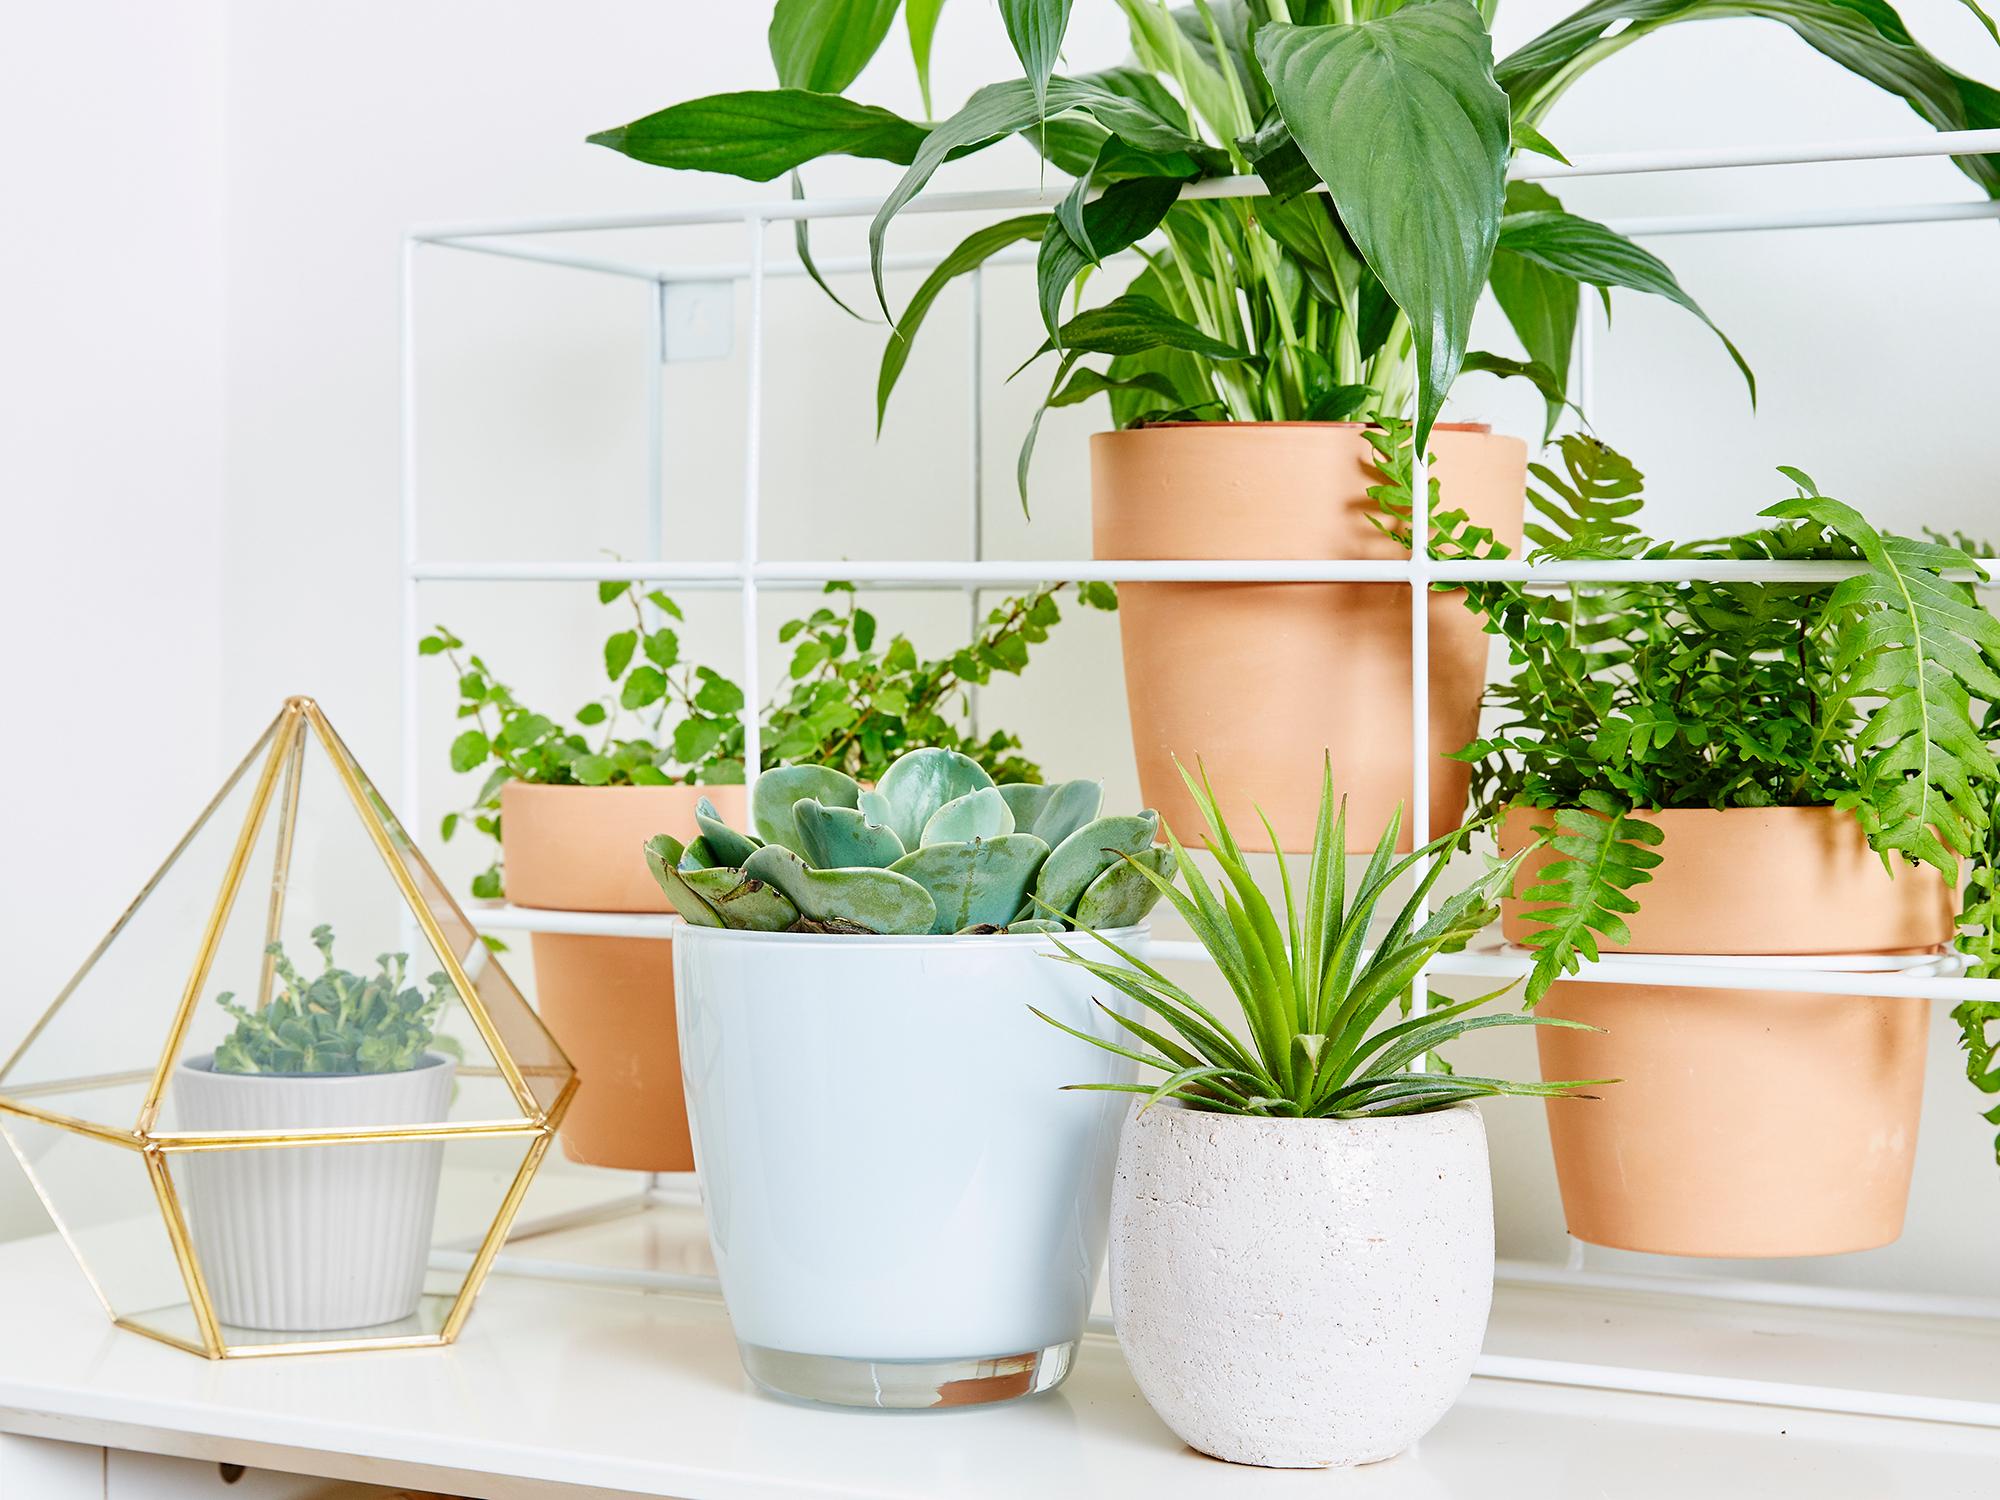 Snazzy How To Create An Garden Creating An Garden Create An Garden garden Creating An Indoor Garden